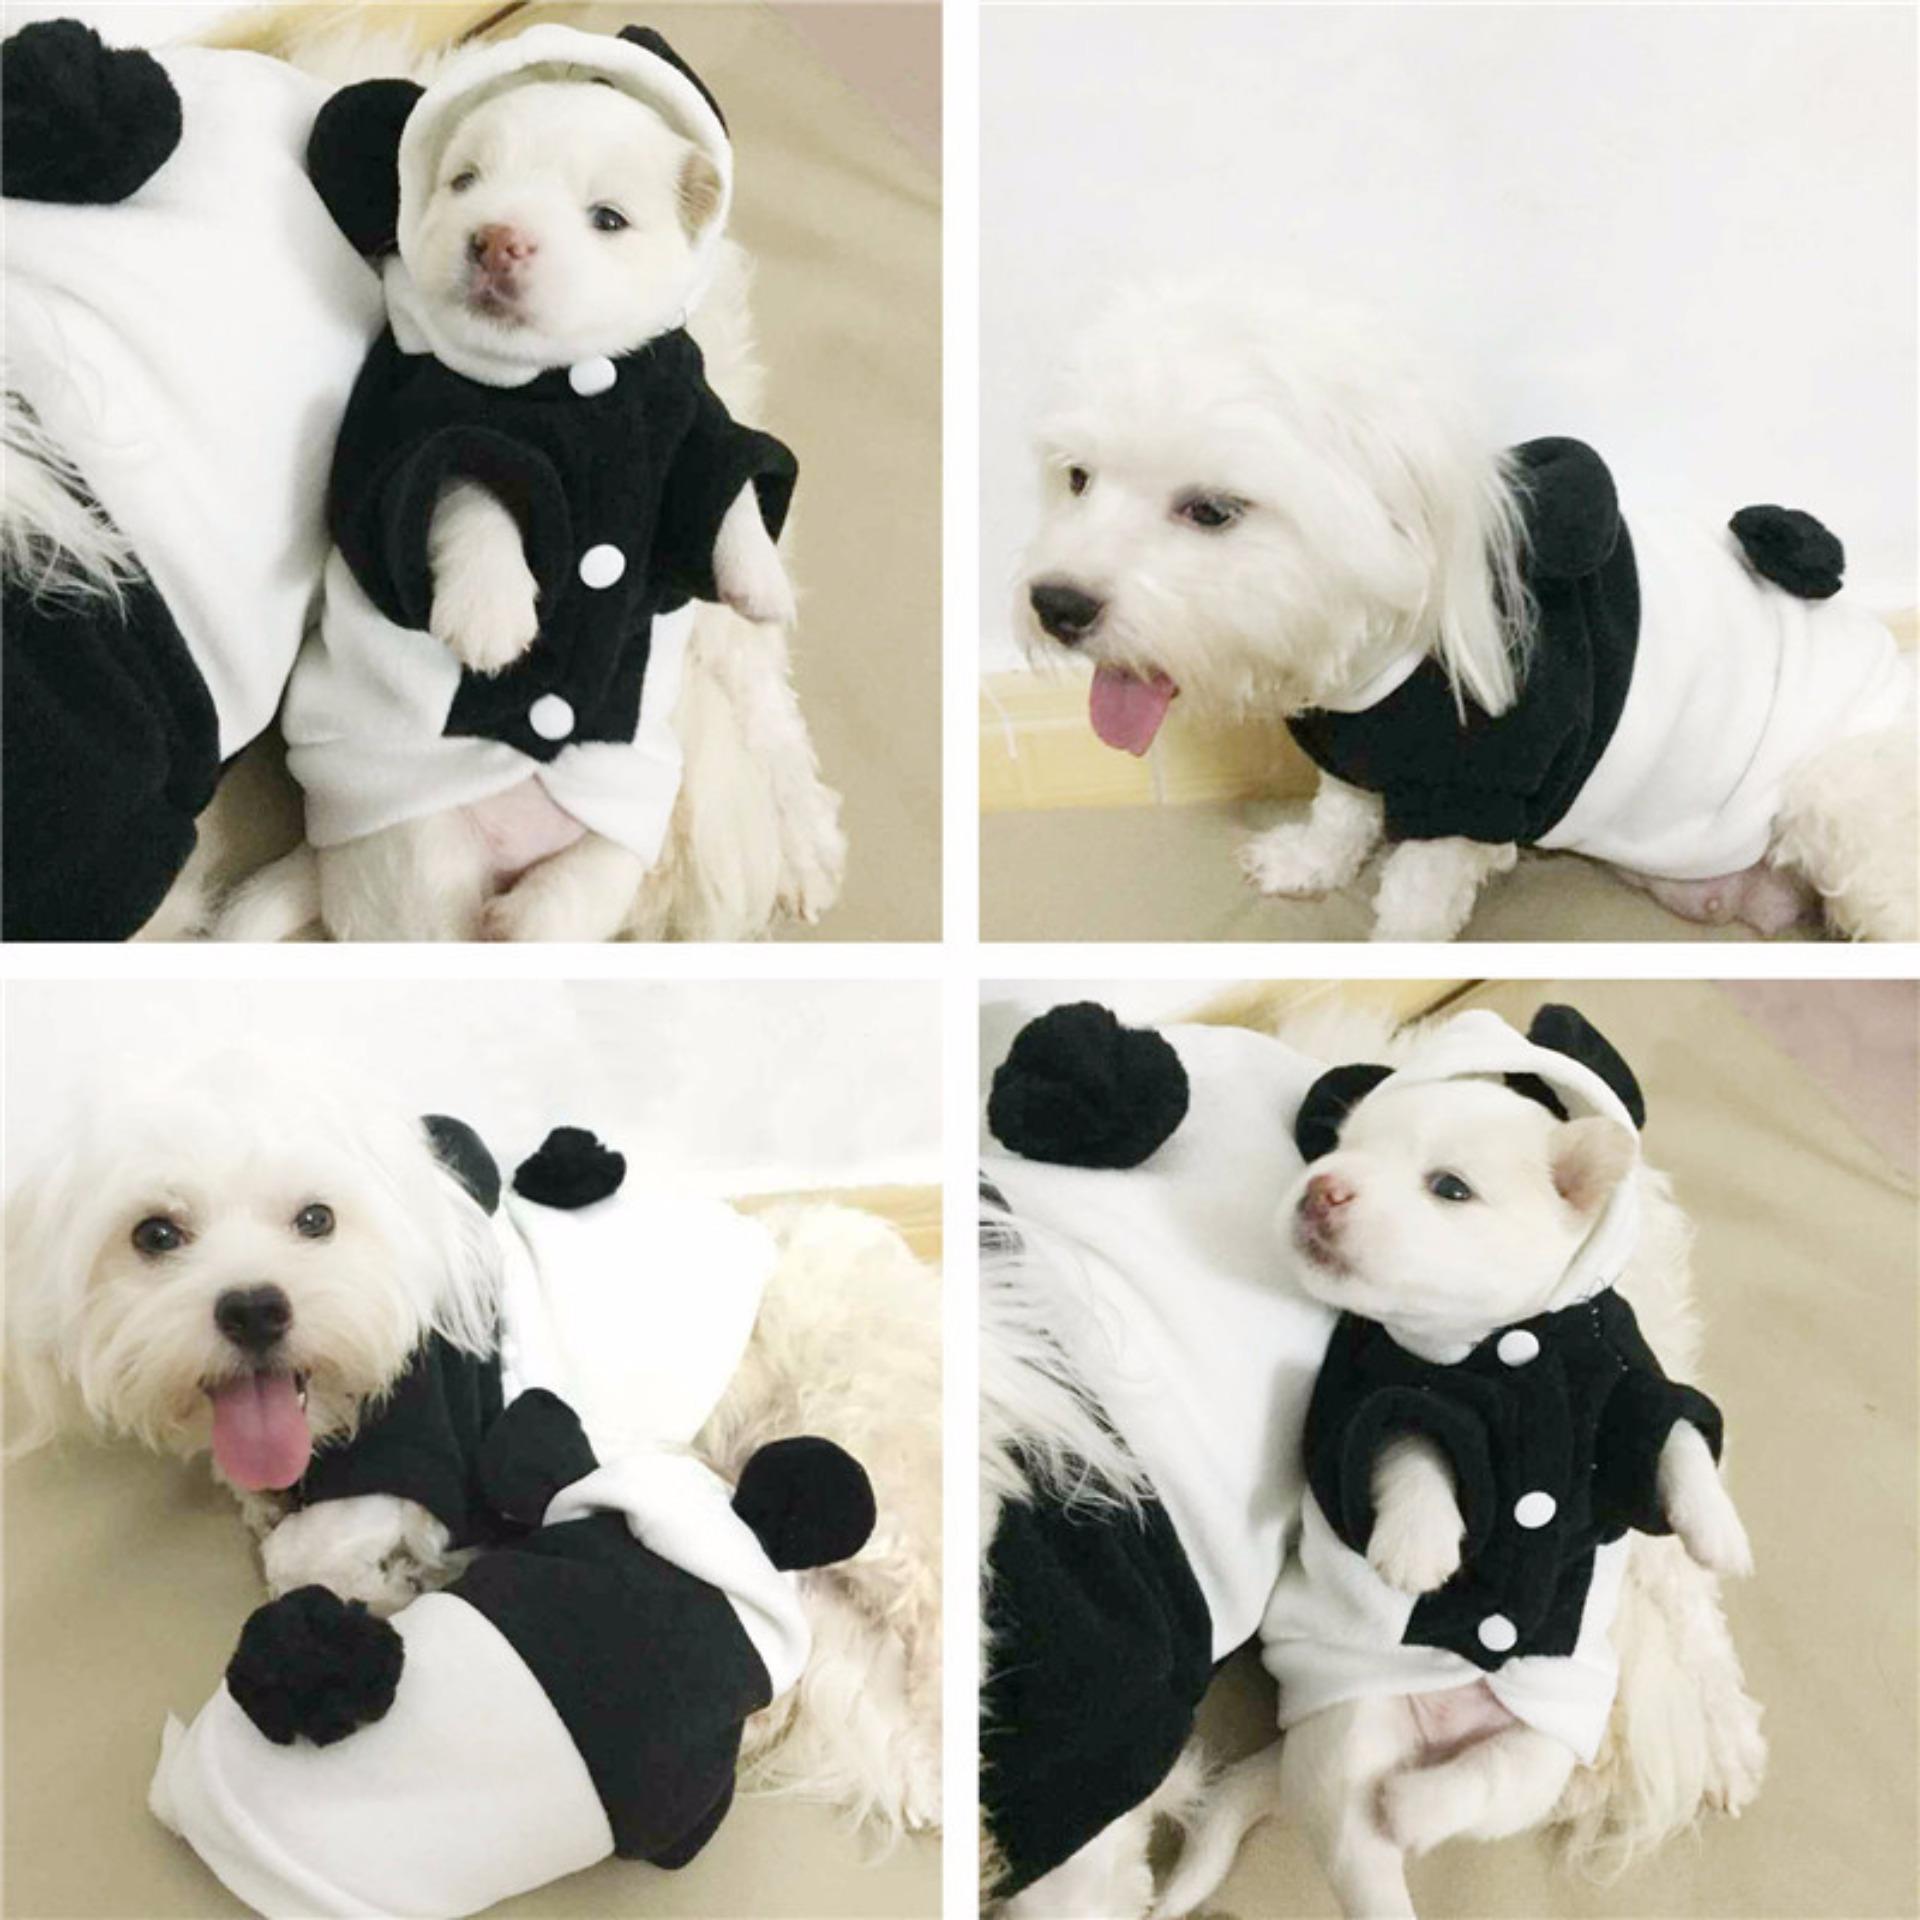 Puppy Pet Kostum / Baju Anjing Motif Panda (Model A) -